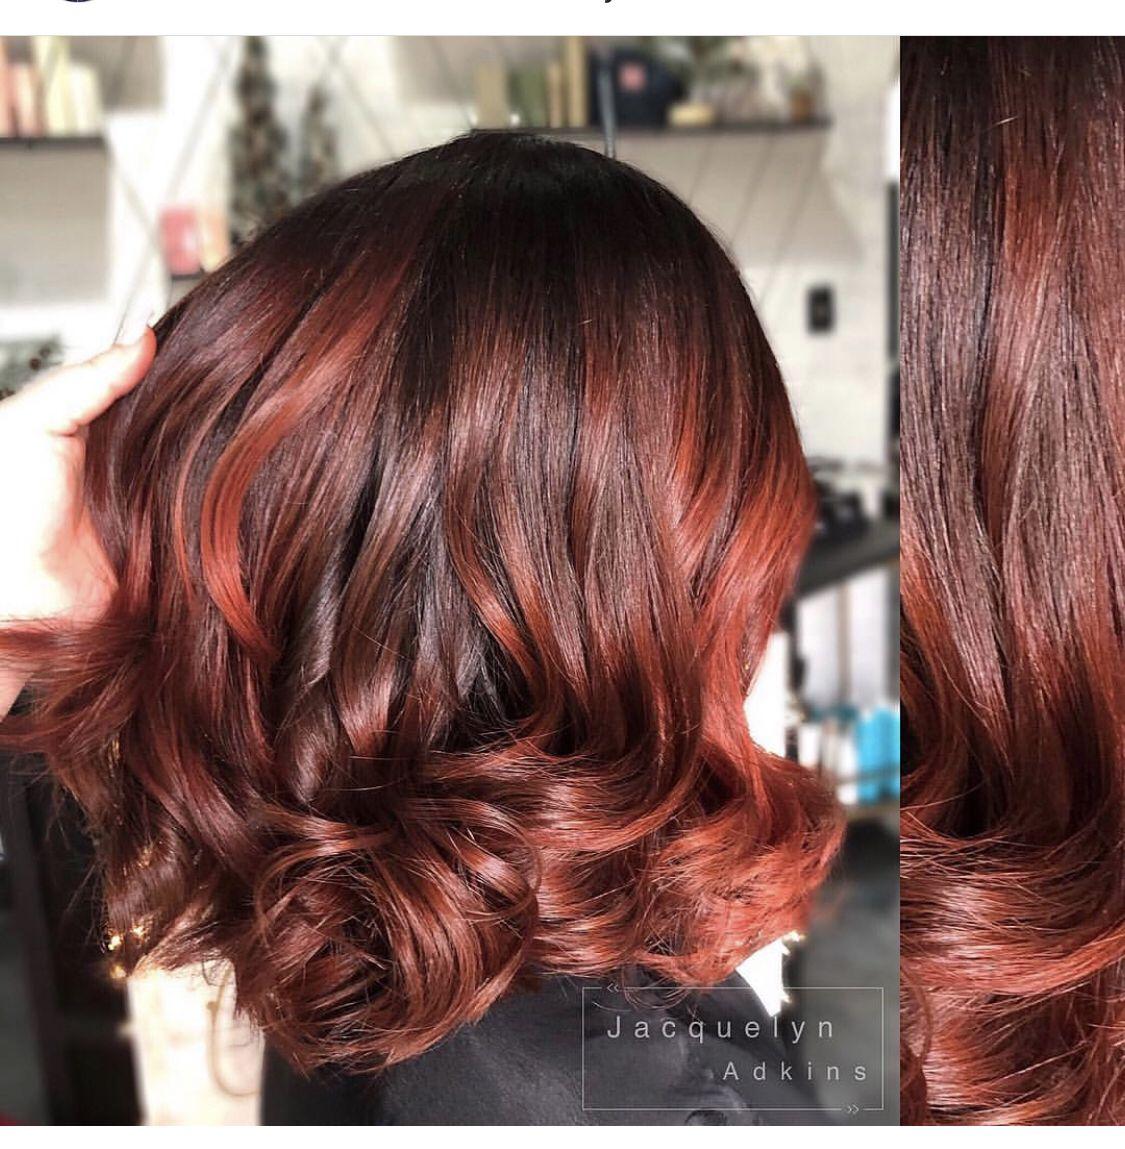 Follow Me On Instagram Unevneib Red Hair Short Red Hair Wavy Hair Curly Hair Wand Curls Hand Painted Hair Balayage Short Red Hair Dark Auburn Hair Hair Styles